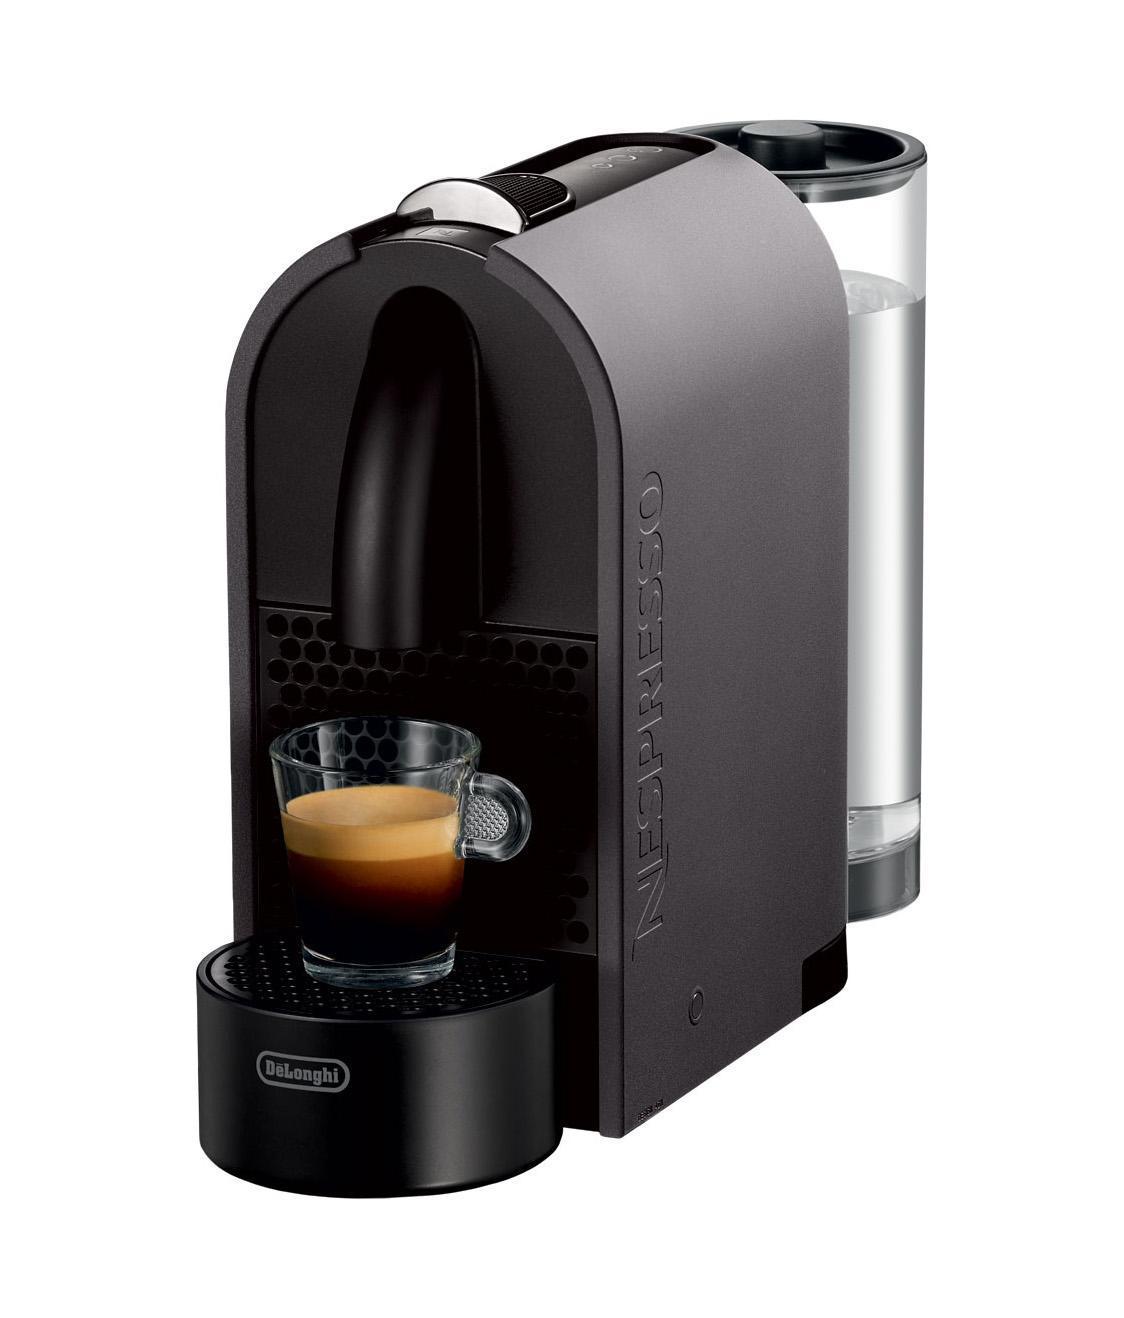 DeLonghi EN 110.GY Nespresso кофемашинаEN 110.GY